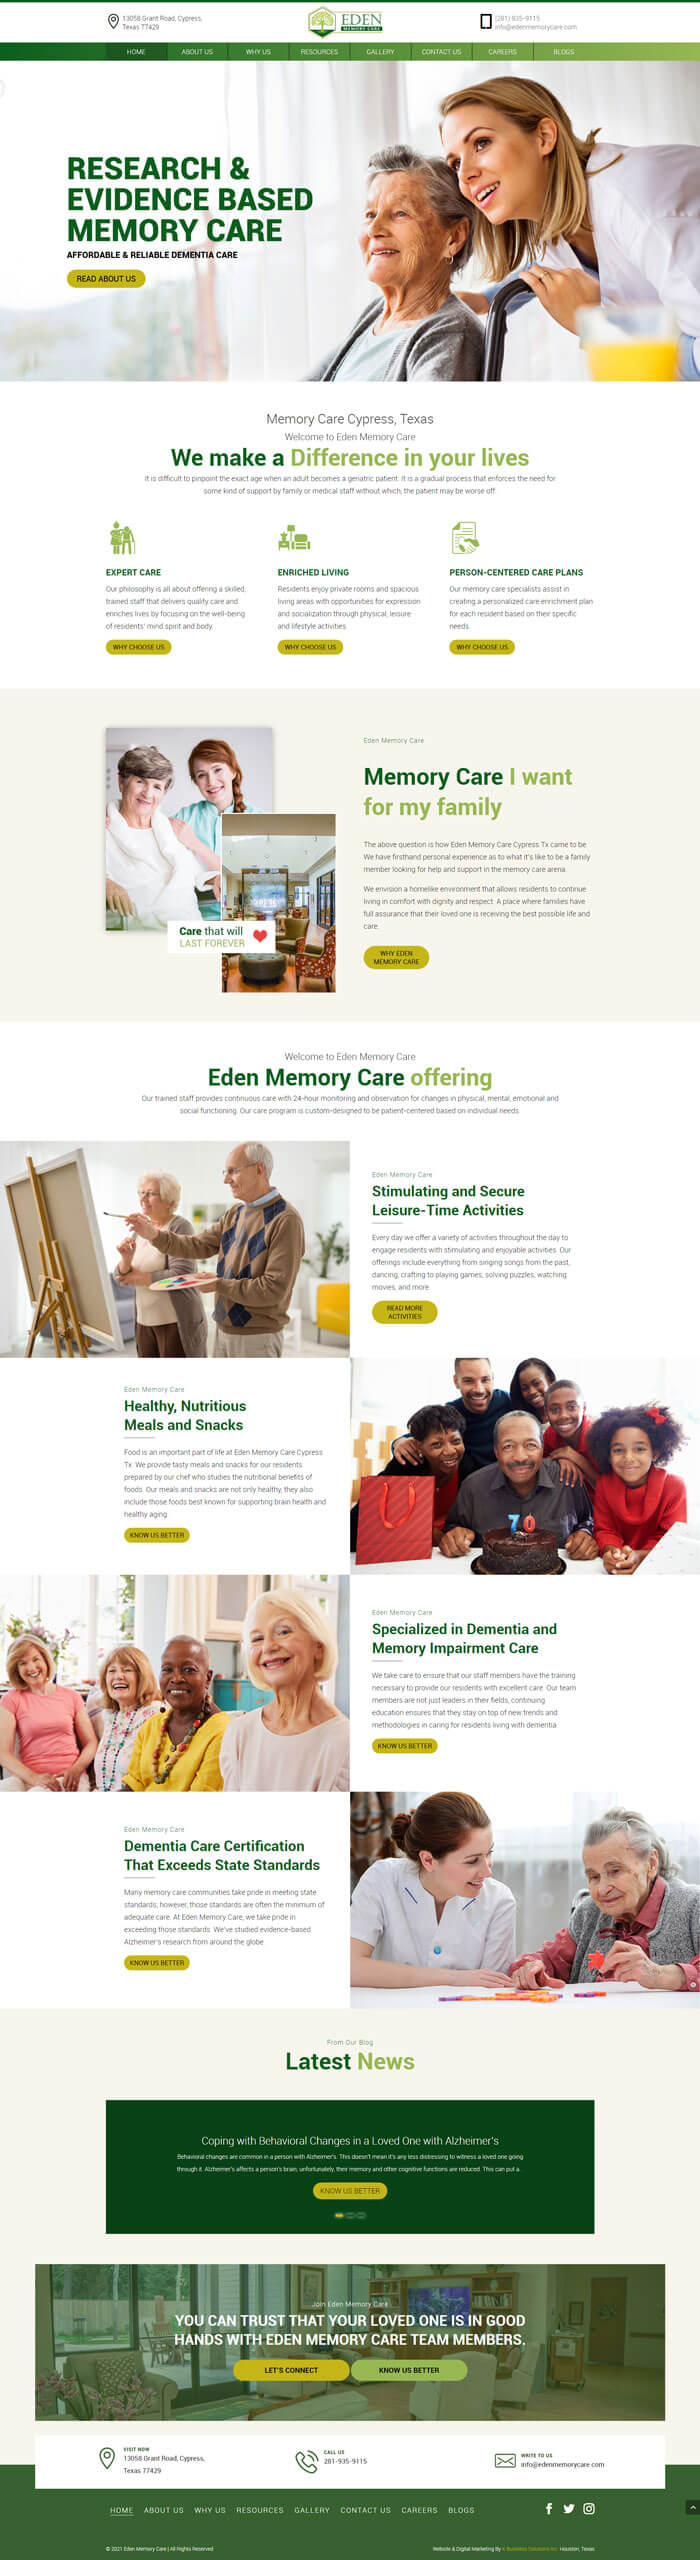 Eden Memory Care